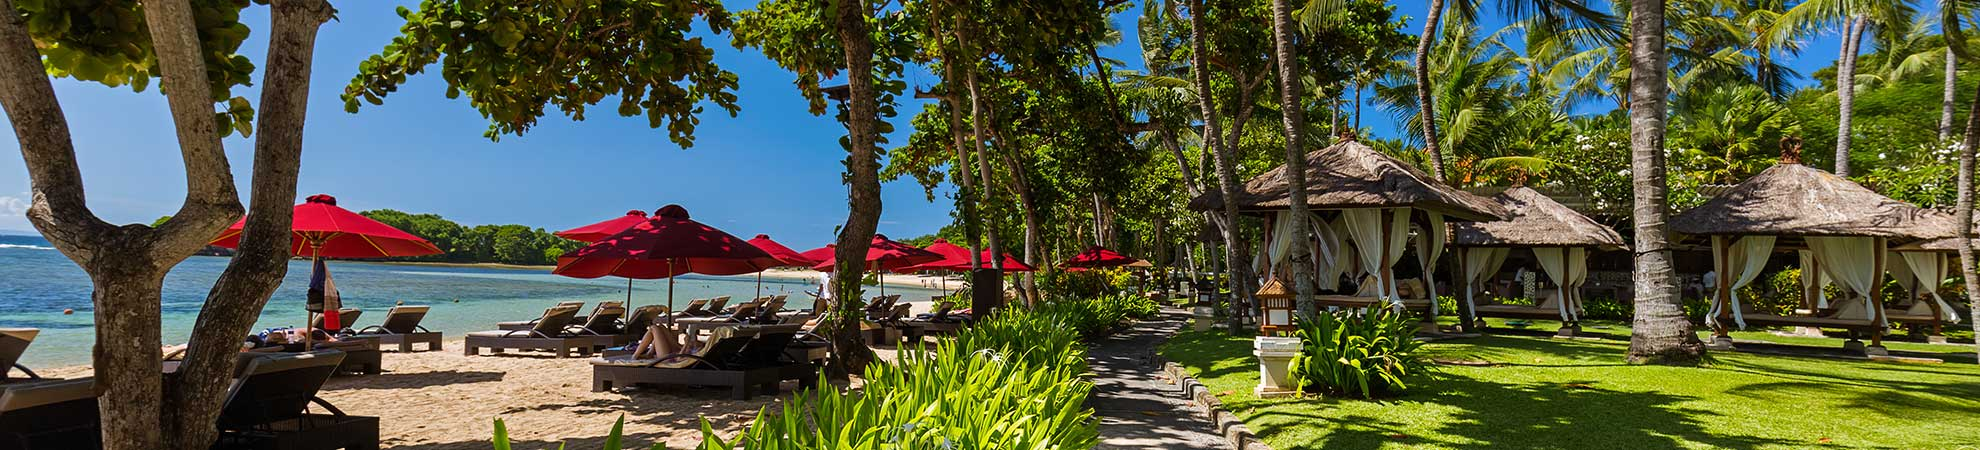 Séjour Bali all inclusive